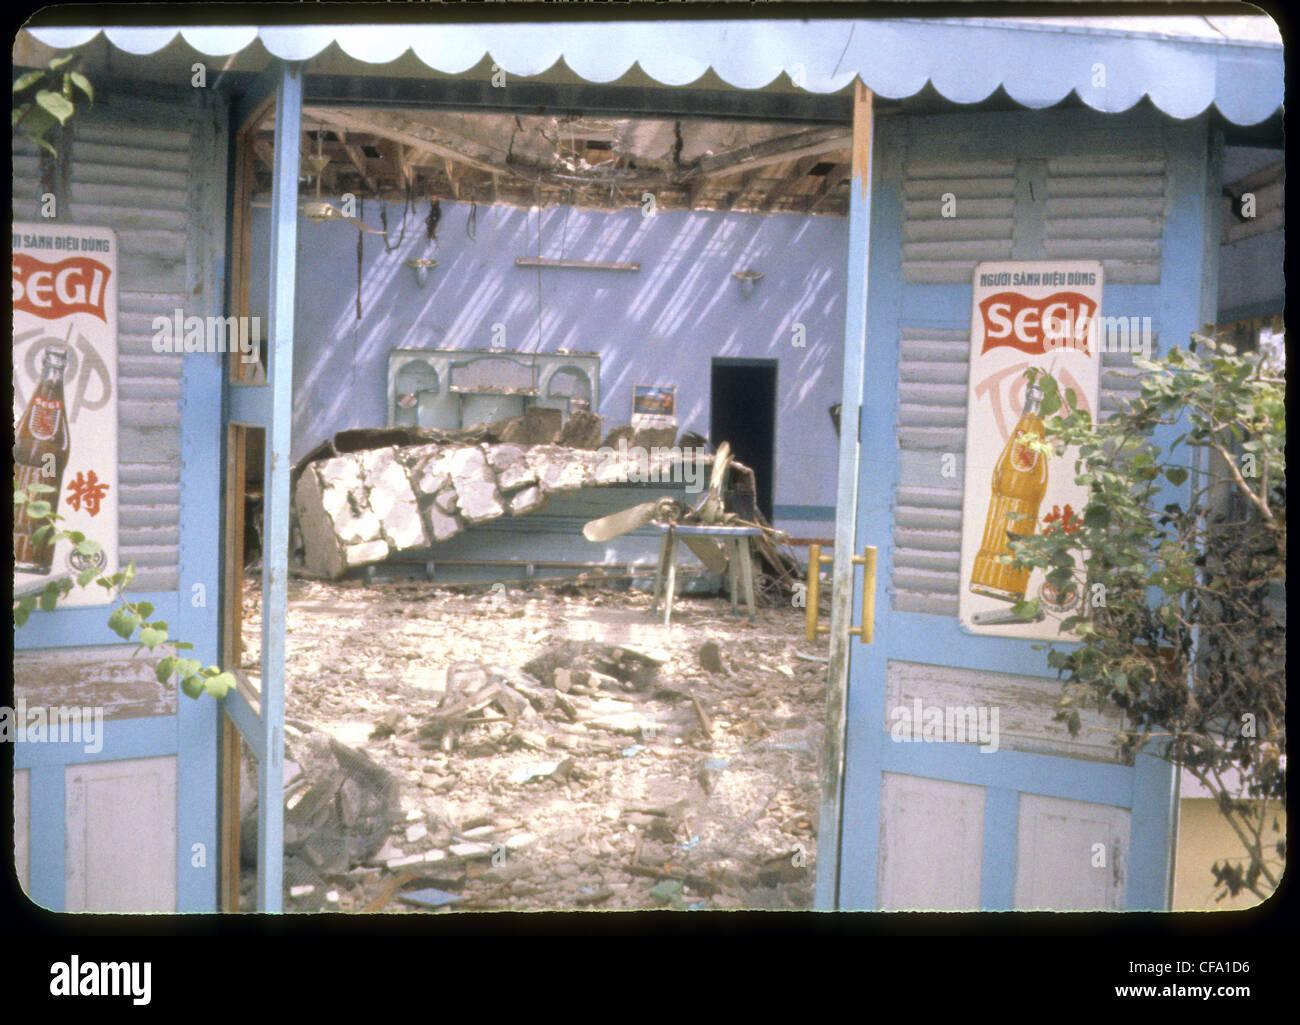 destroyed bar after attack during Vietnam War segi soft drinks vietnamese - Stock Image